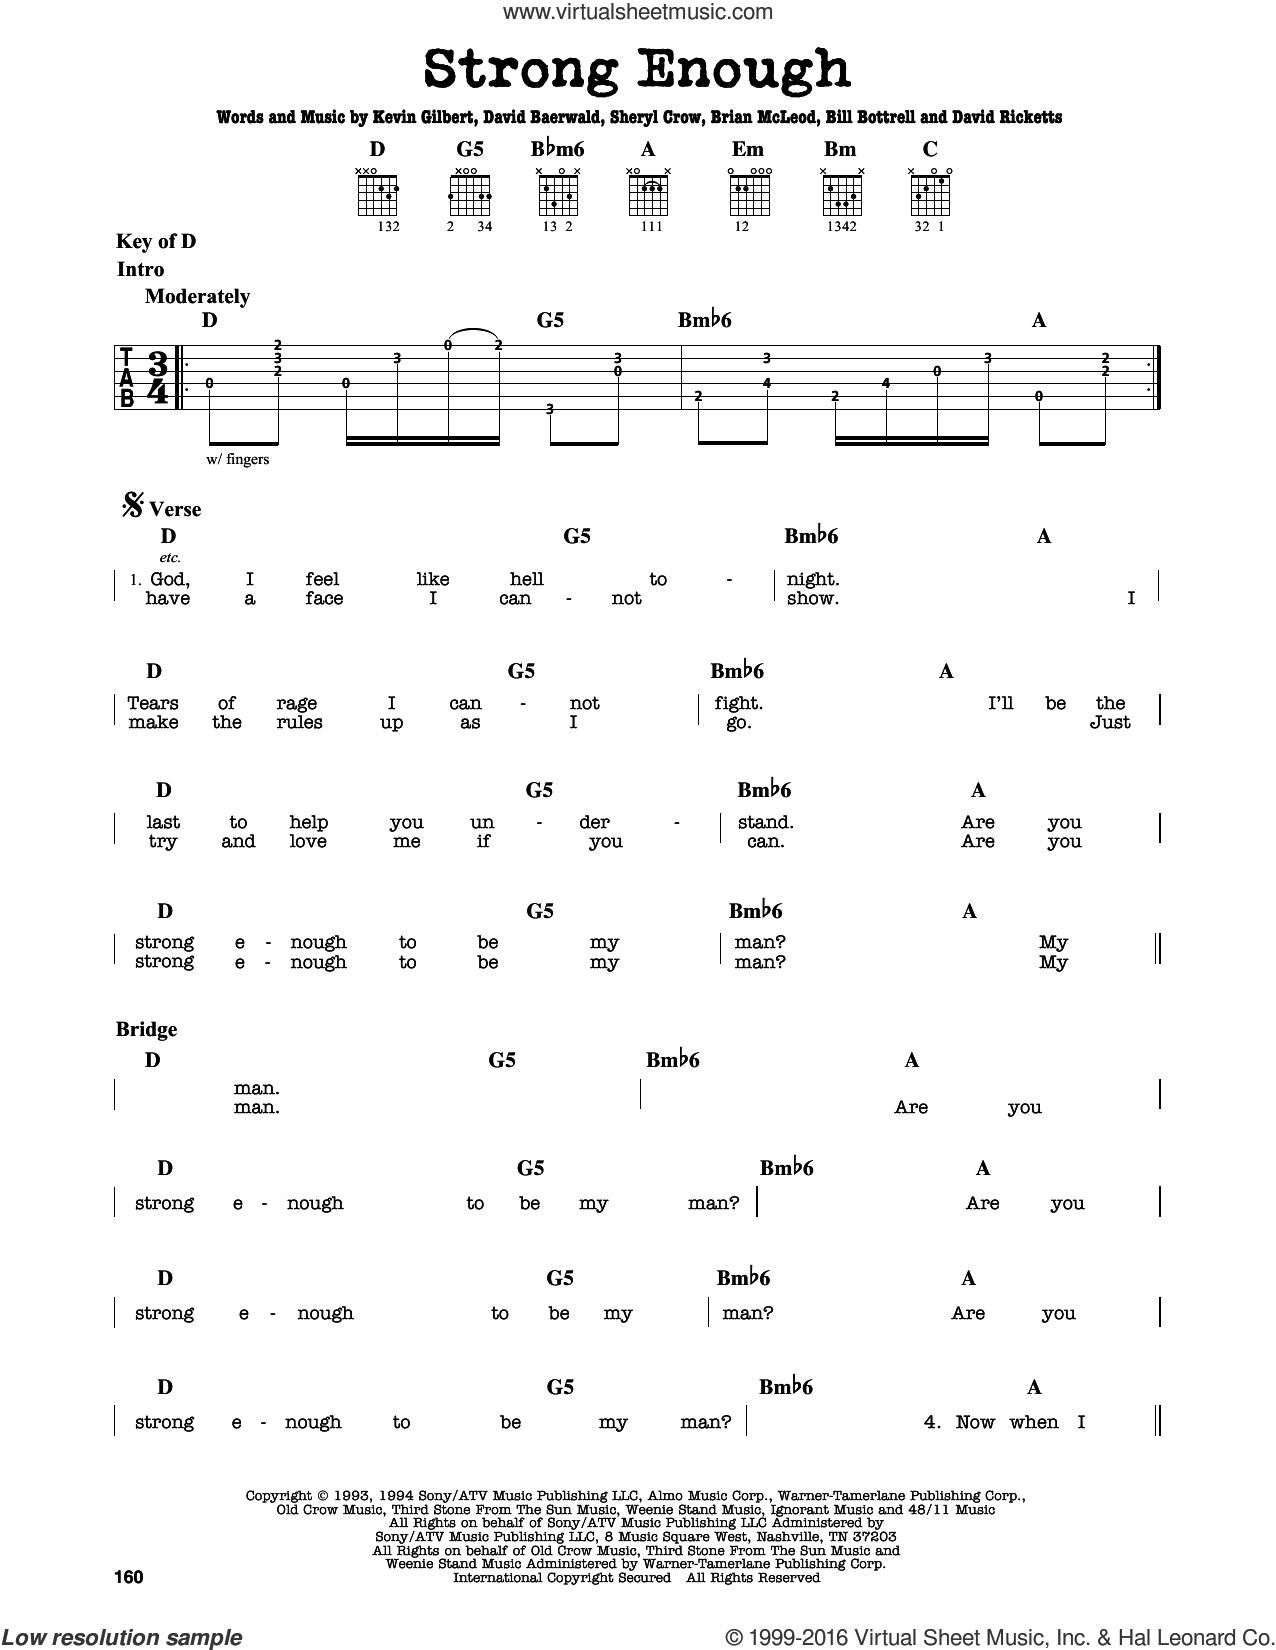 Strong Enough sheet music for guitar solo (lead sheet) by Sheryl Crow, Bill Bottrell, Brian MacLeod, David Baerwald, David Ricketts and Kevin Gilbert, intermediate guitar (lead sheet)